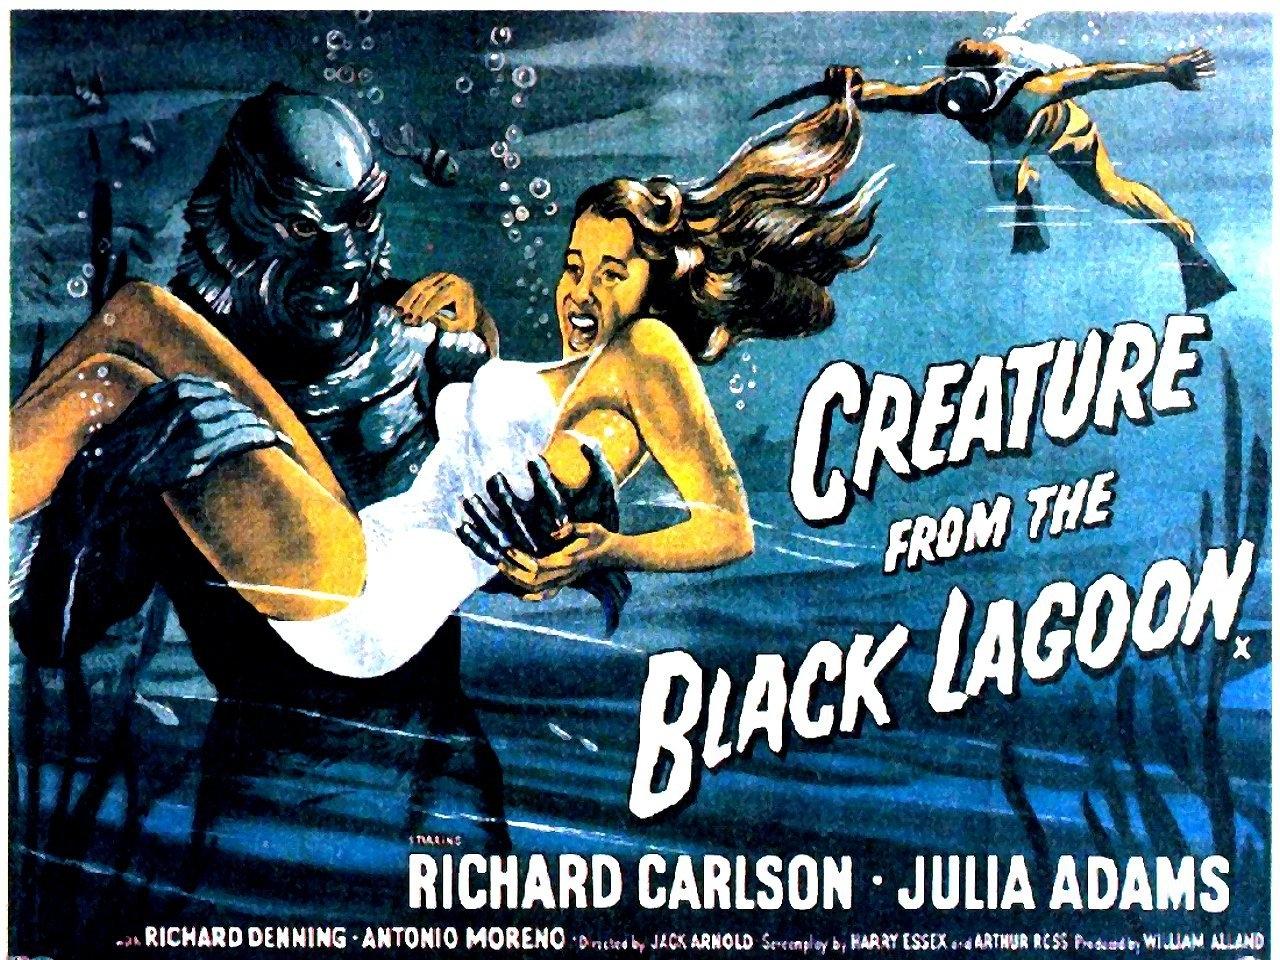 classic cinema wallpaper - photo #27